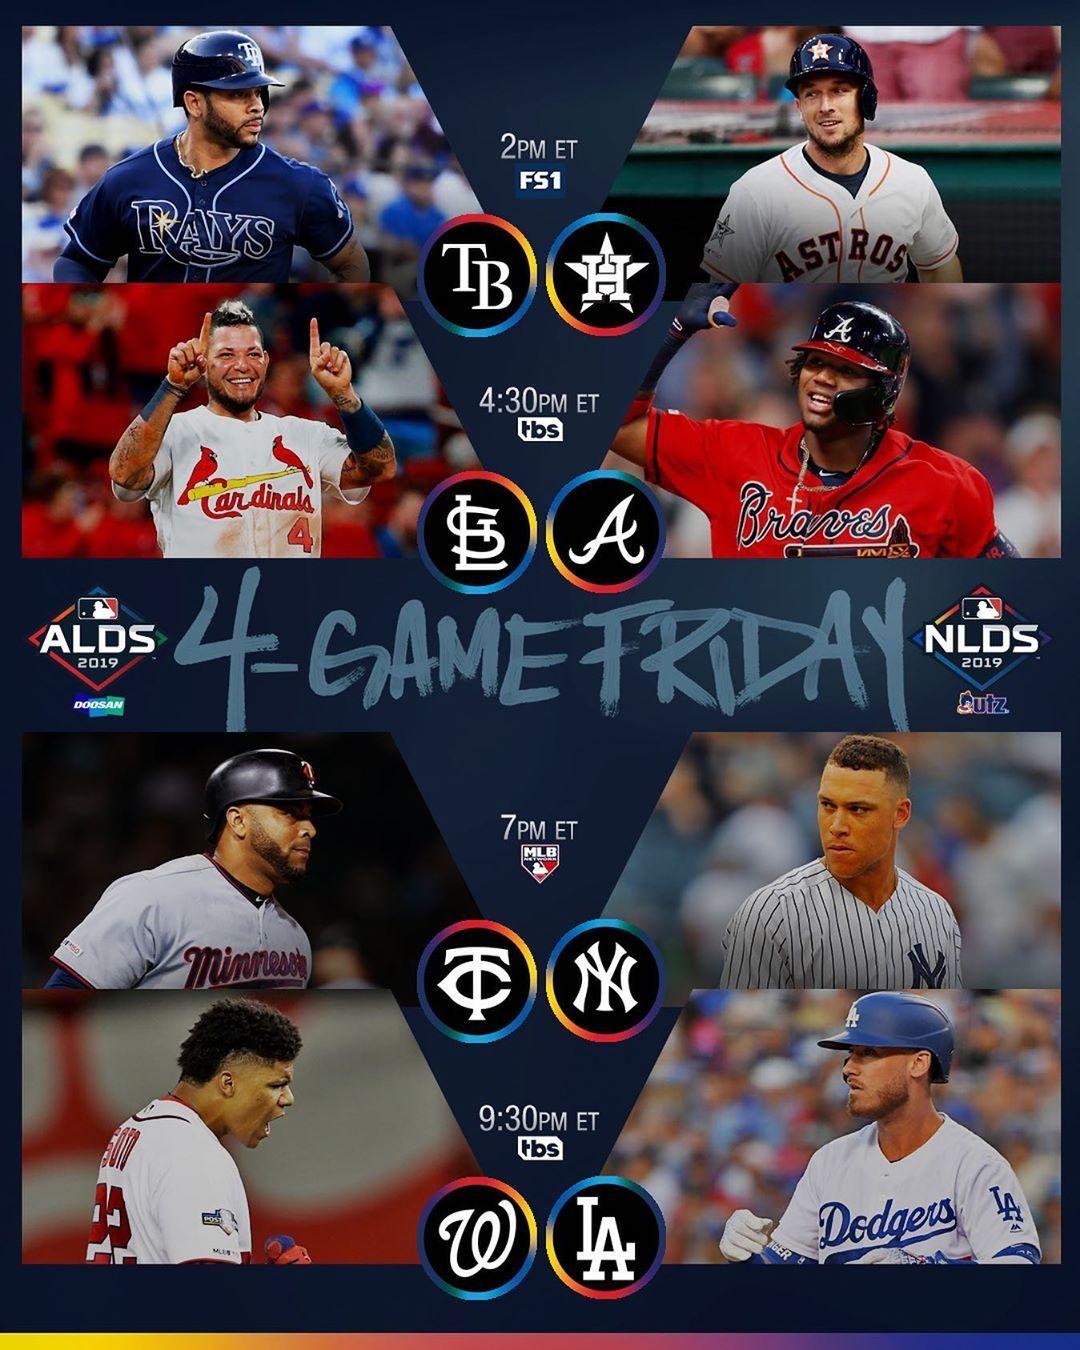 Mlb It Doesn T Get Much Better Than This 4gamefriday 4gamefriday Baseball Big4 Bigfour Big4 Bigfour Bi Mlb Braves Major League Baseball